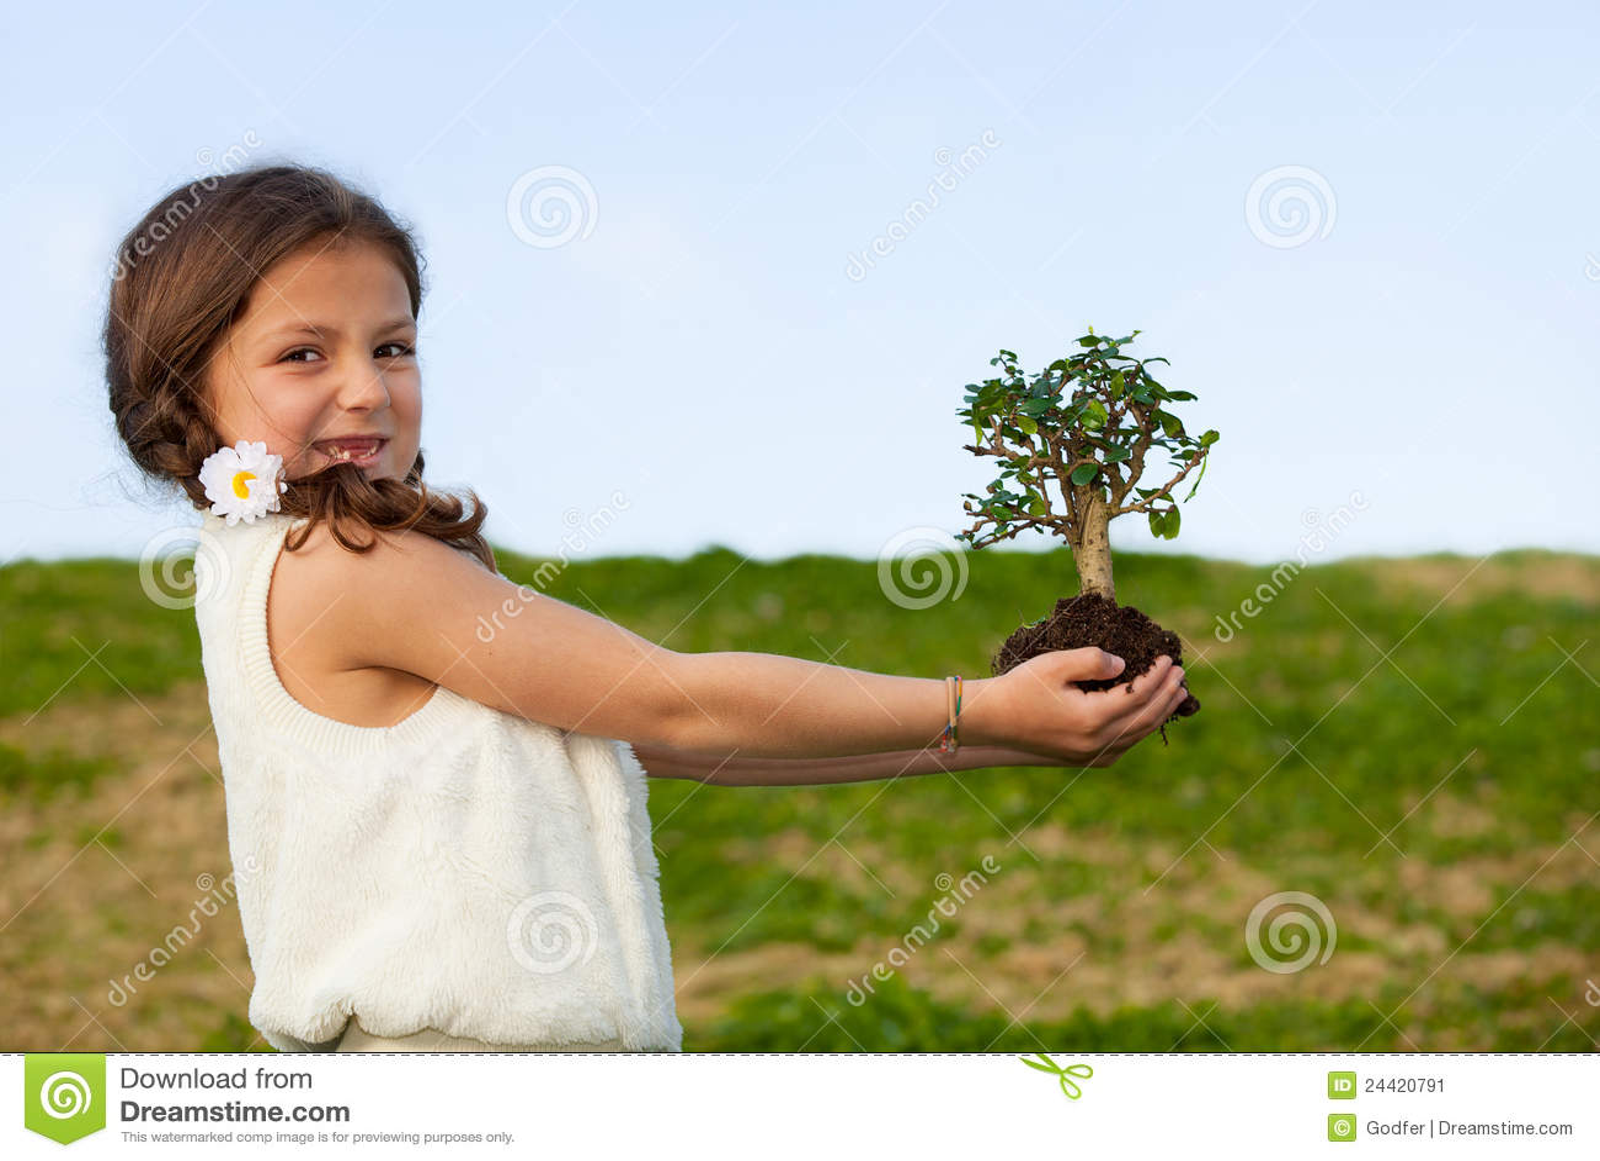 Umgebung und Natur